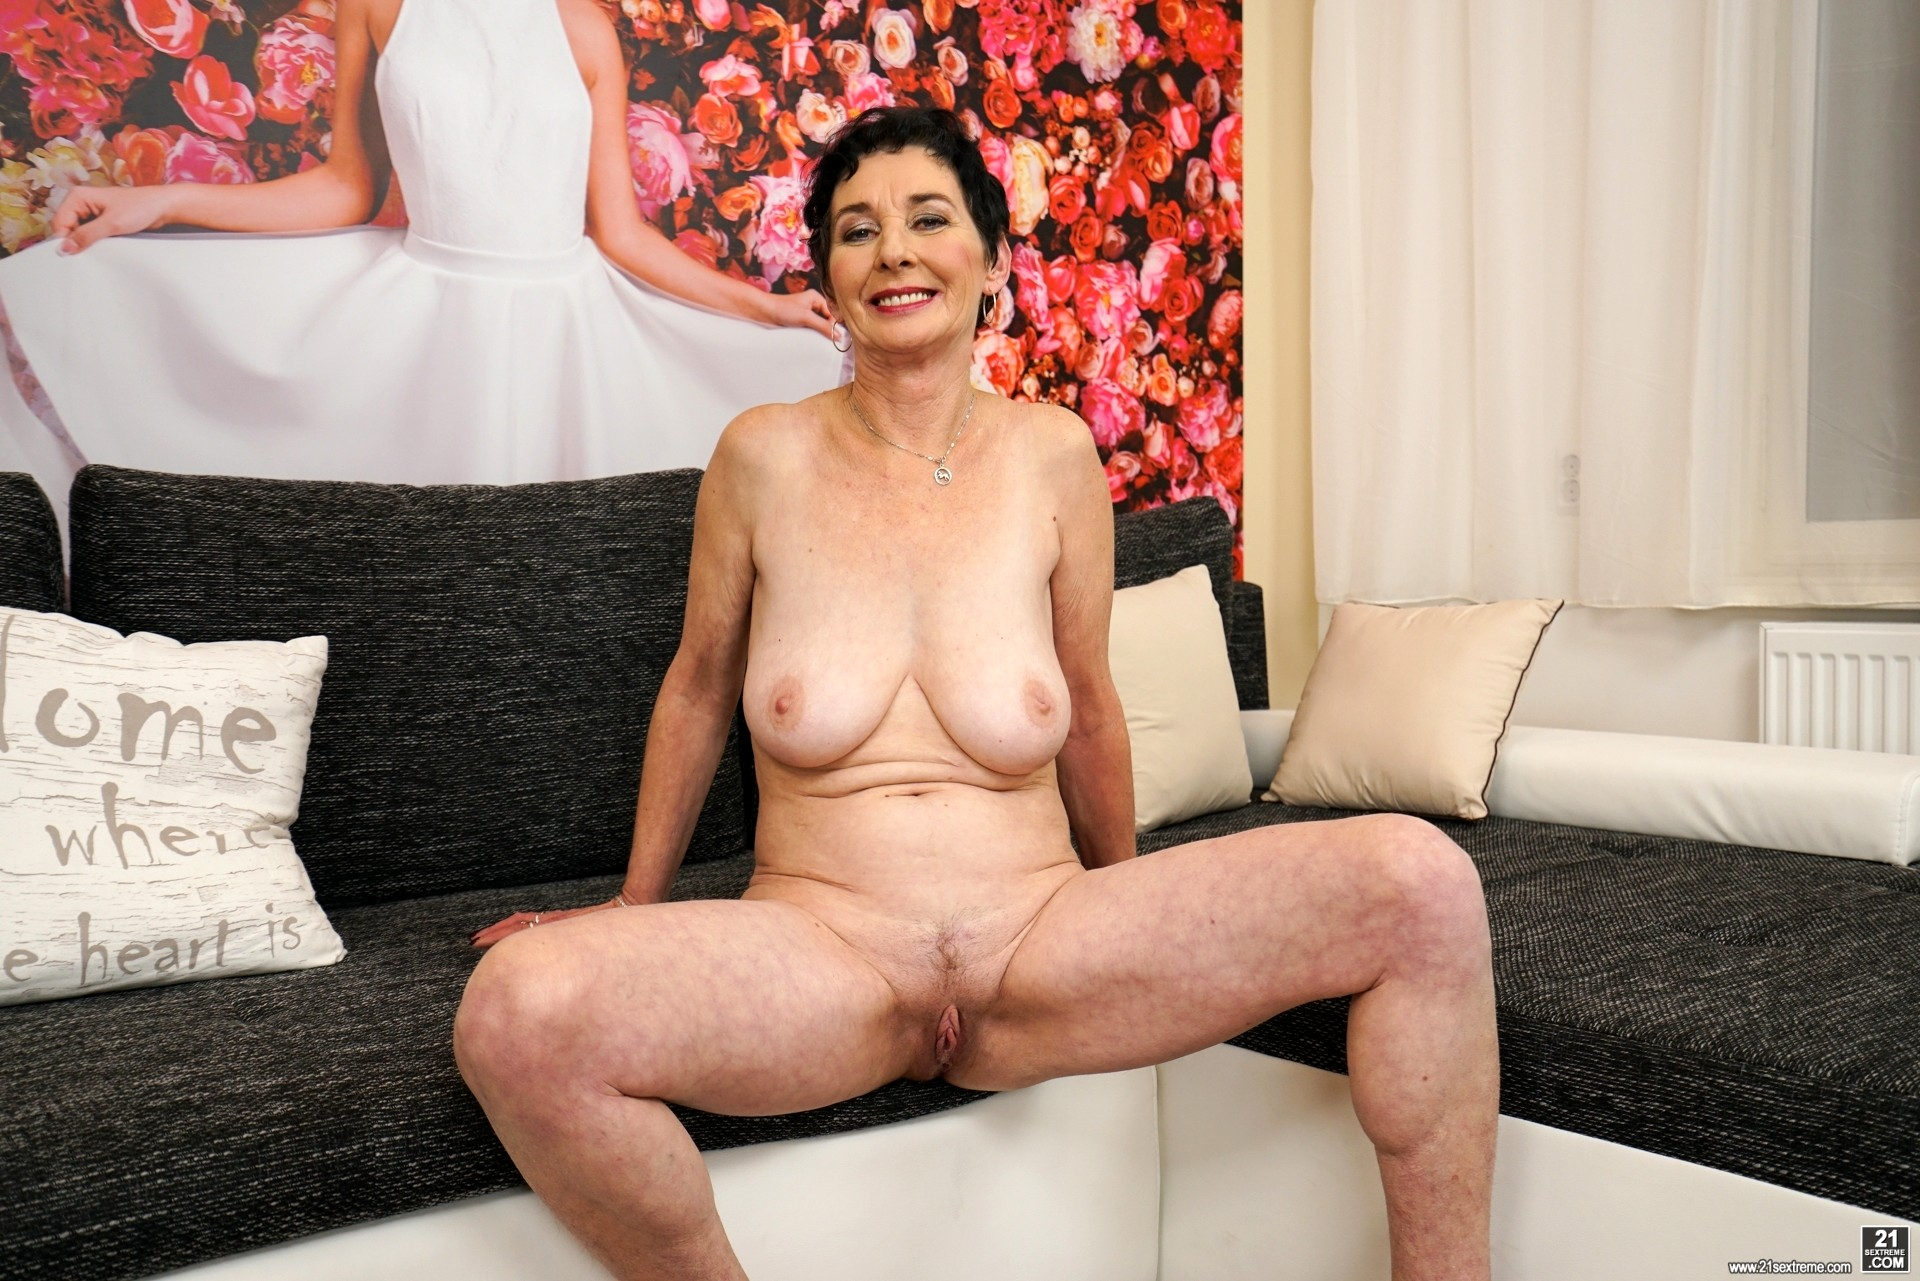 Babe Today 21 Sextury Pixie Top Secret Granny Webcam -6695